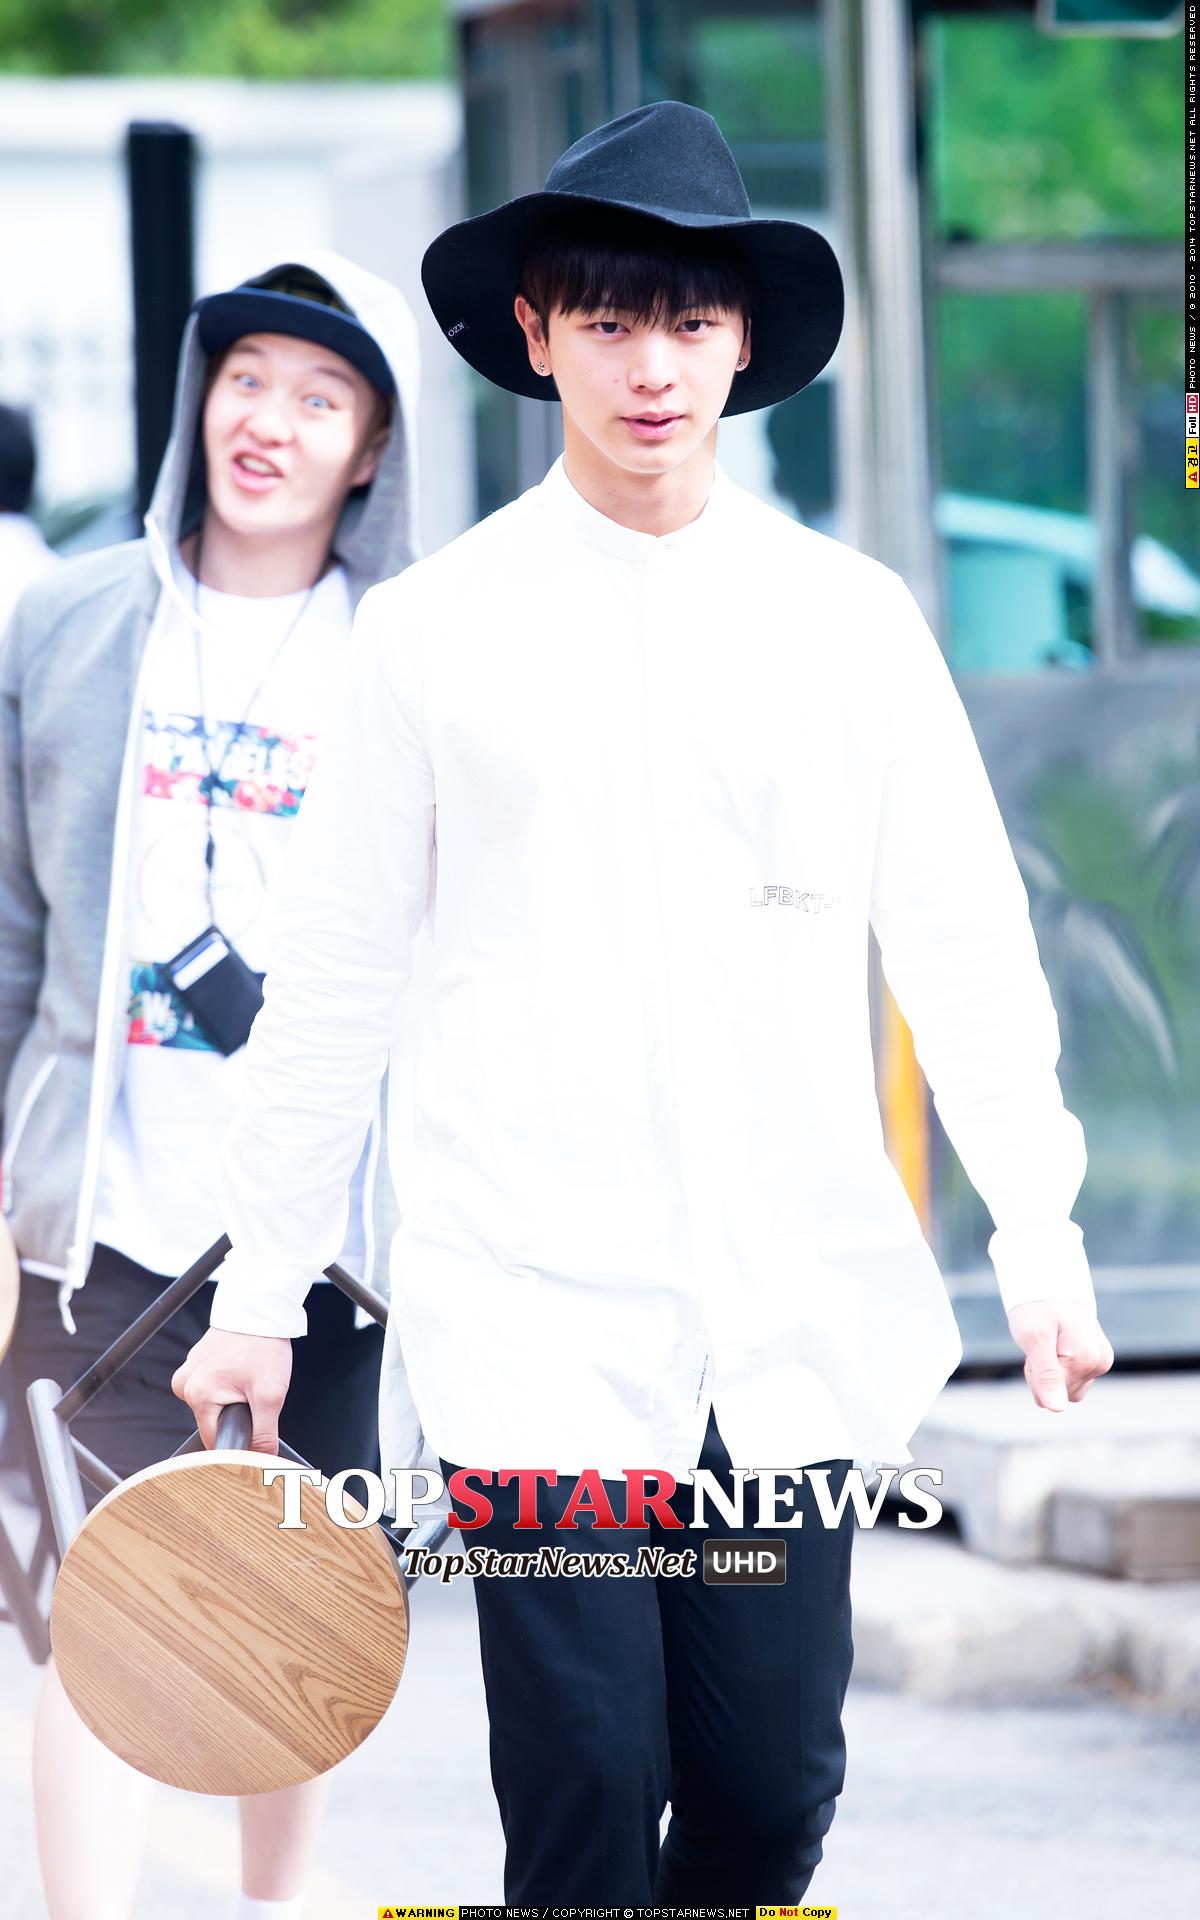 BTOB忙內星材在上班路上以白襯衫搭配軟沿寬帽,但是手提凳子怎麼有種文藝混混的感覺?(我絕對不會說後面的昌燮比較吸引我)